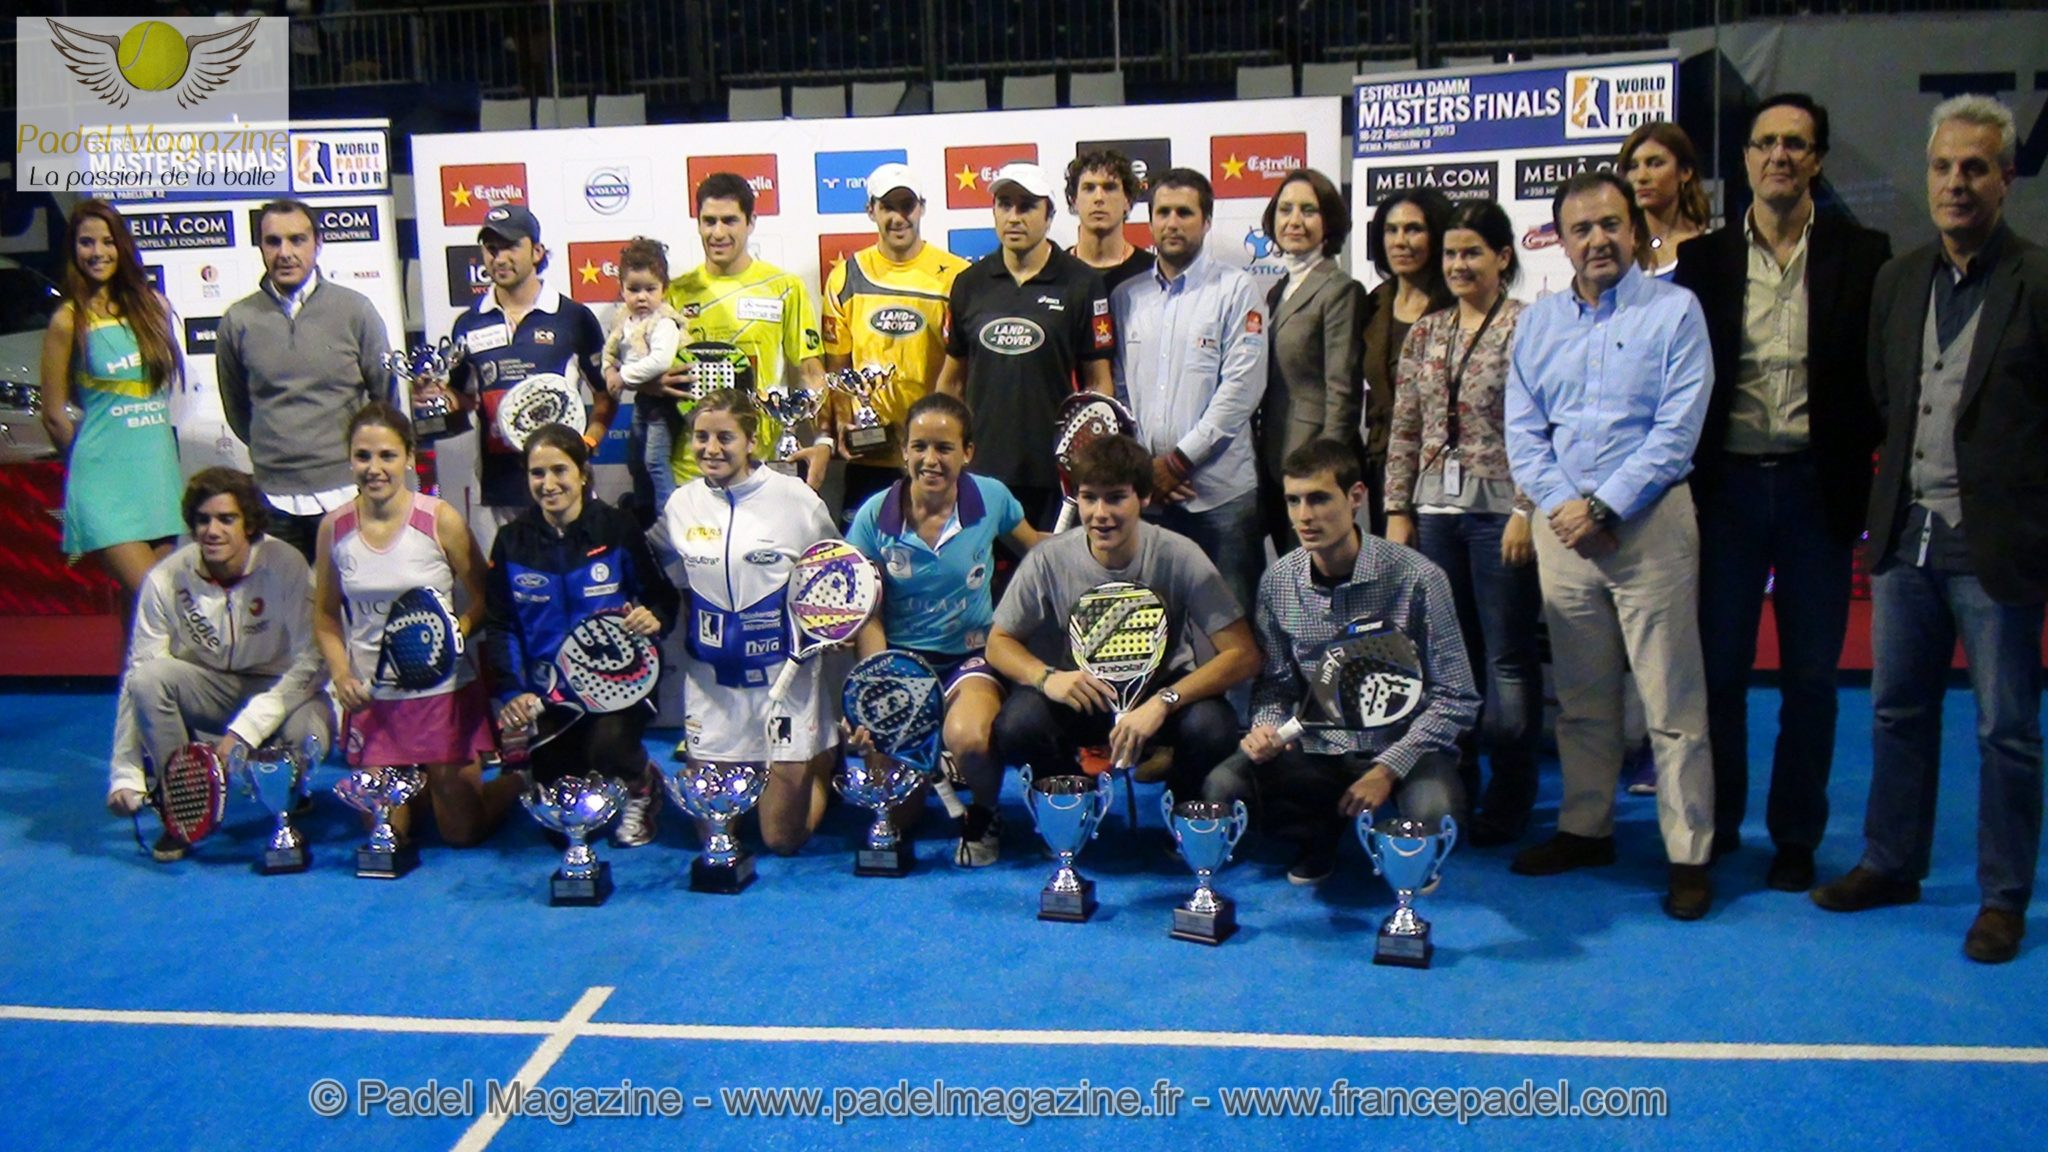 Finalistes des Masters 2014